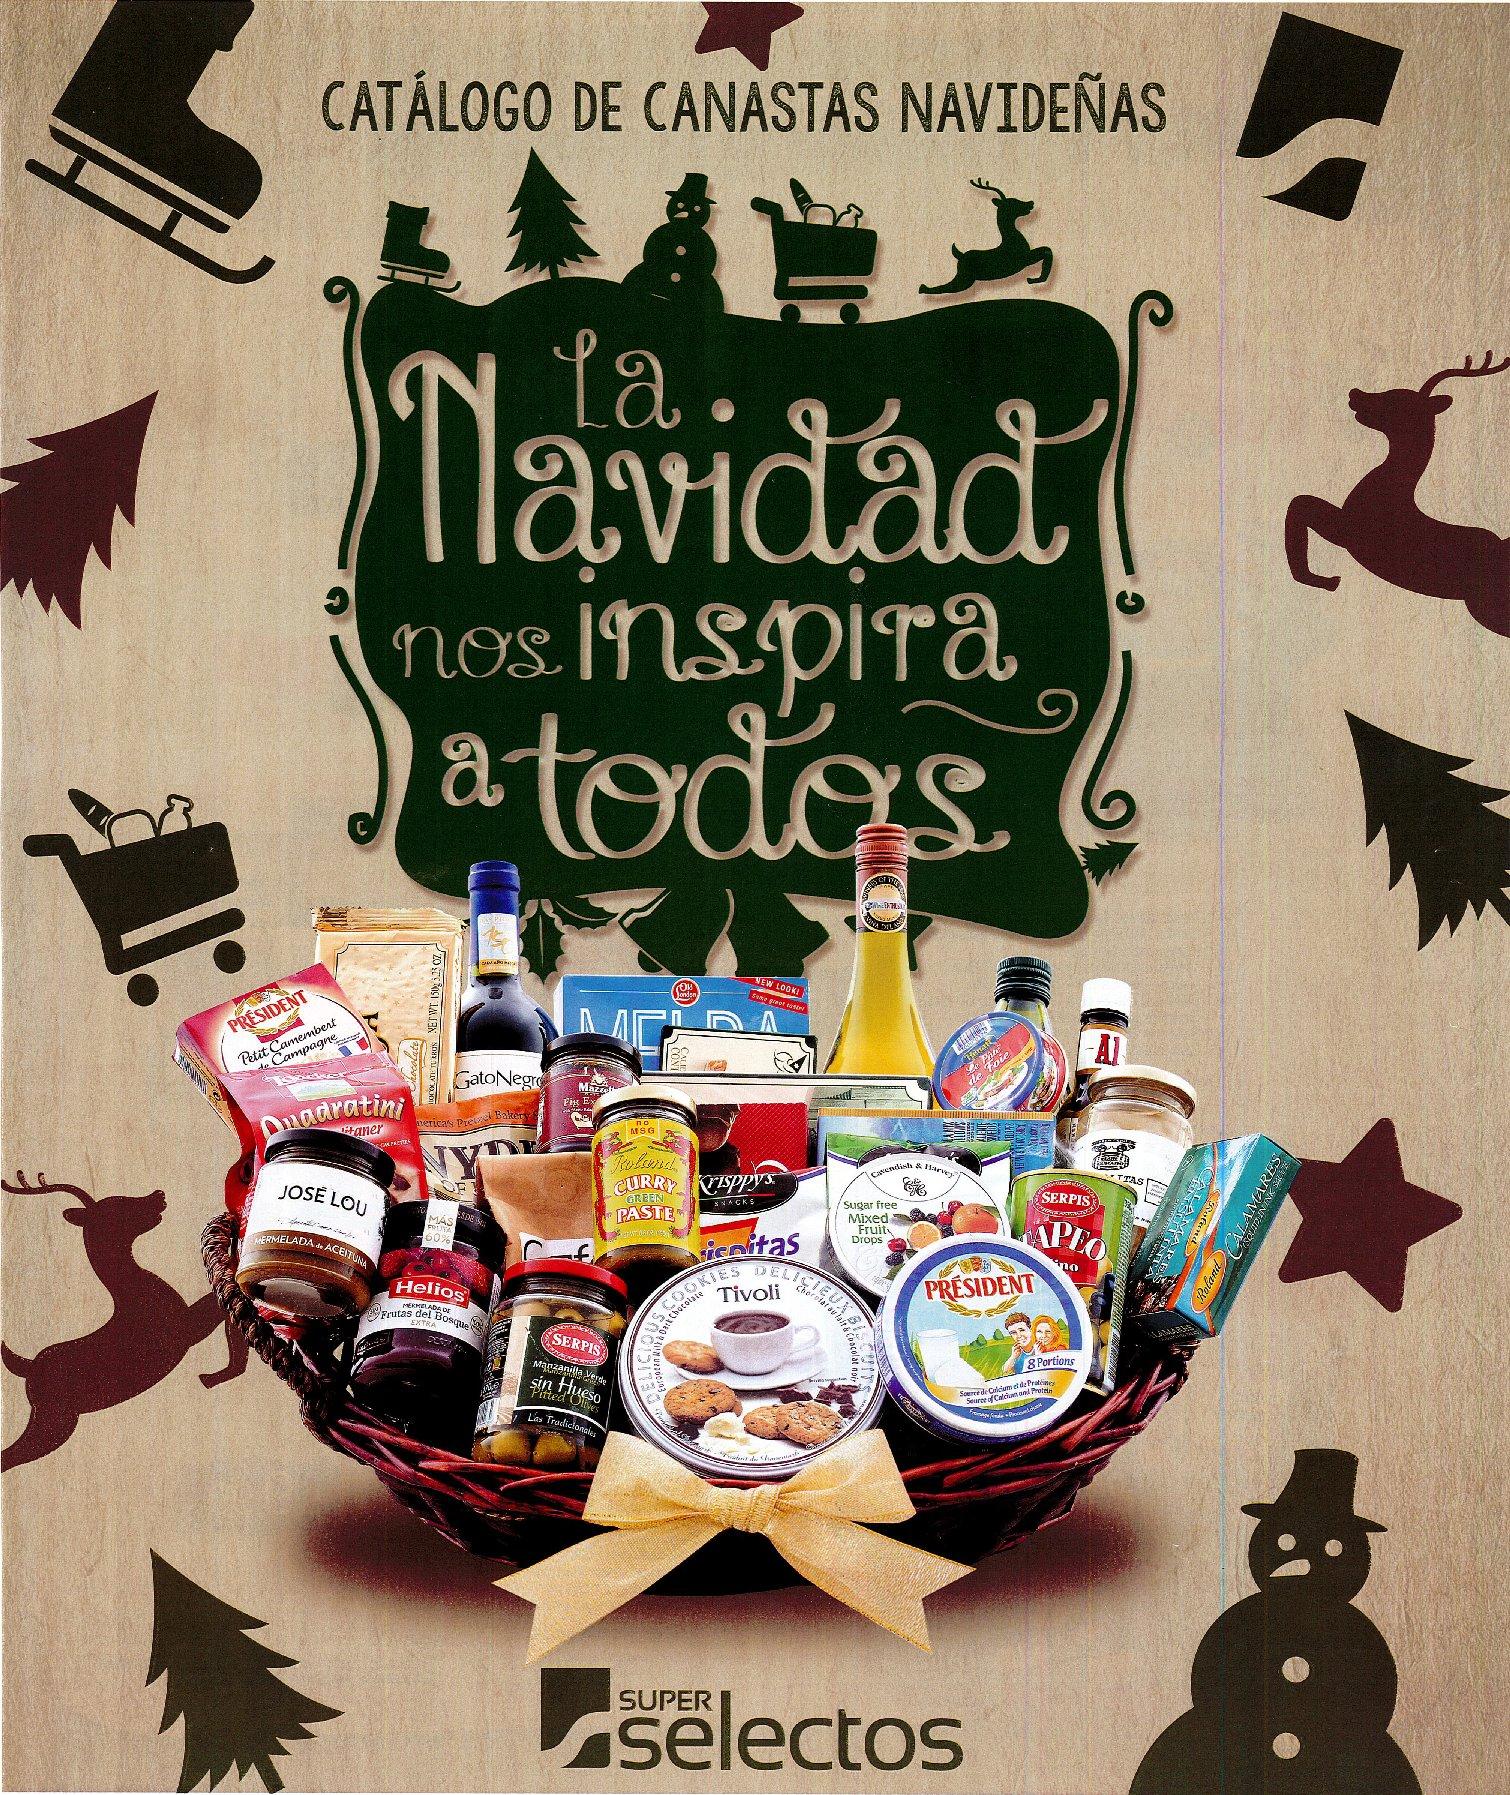 Super Selectos Catalogo de Canastas navideñas 2016